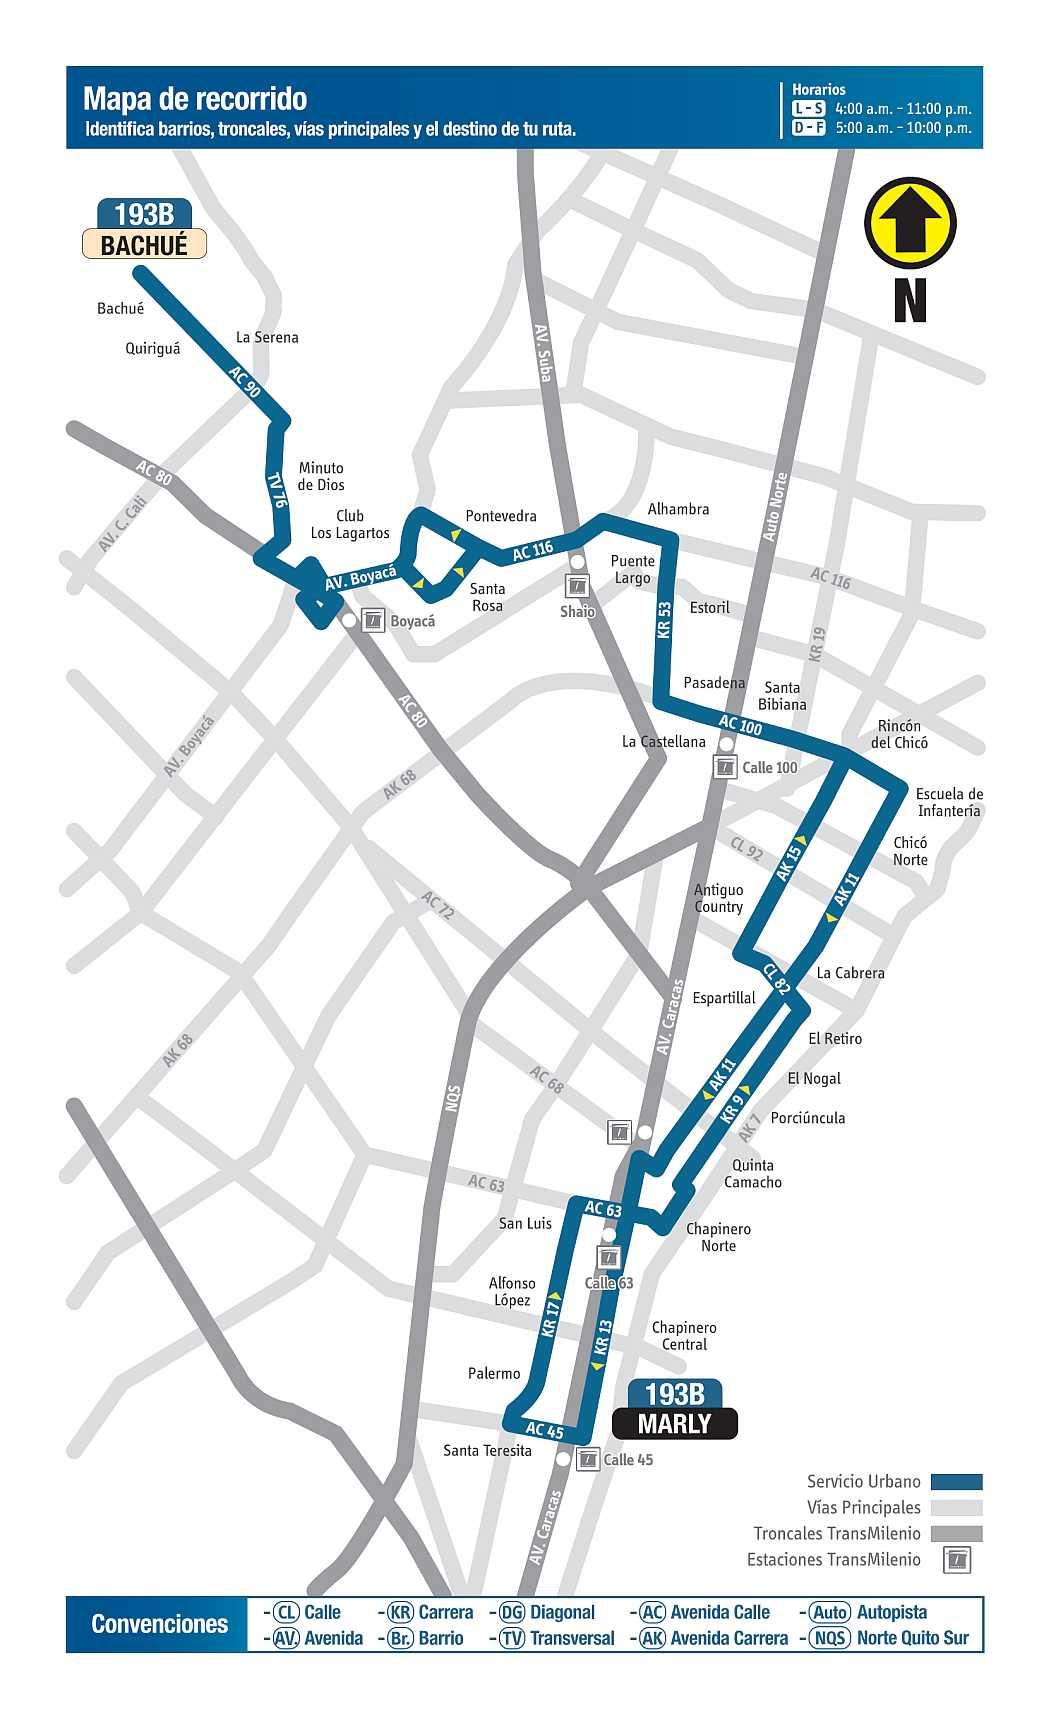 193B Bachué - Marly, mapa bus urbano Bogotá